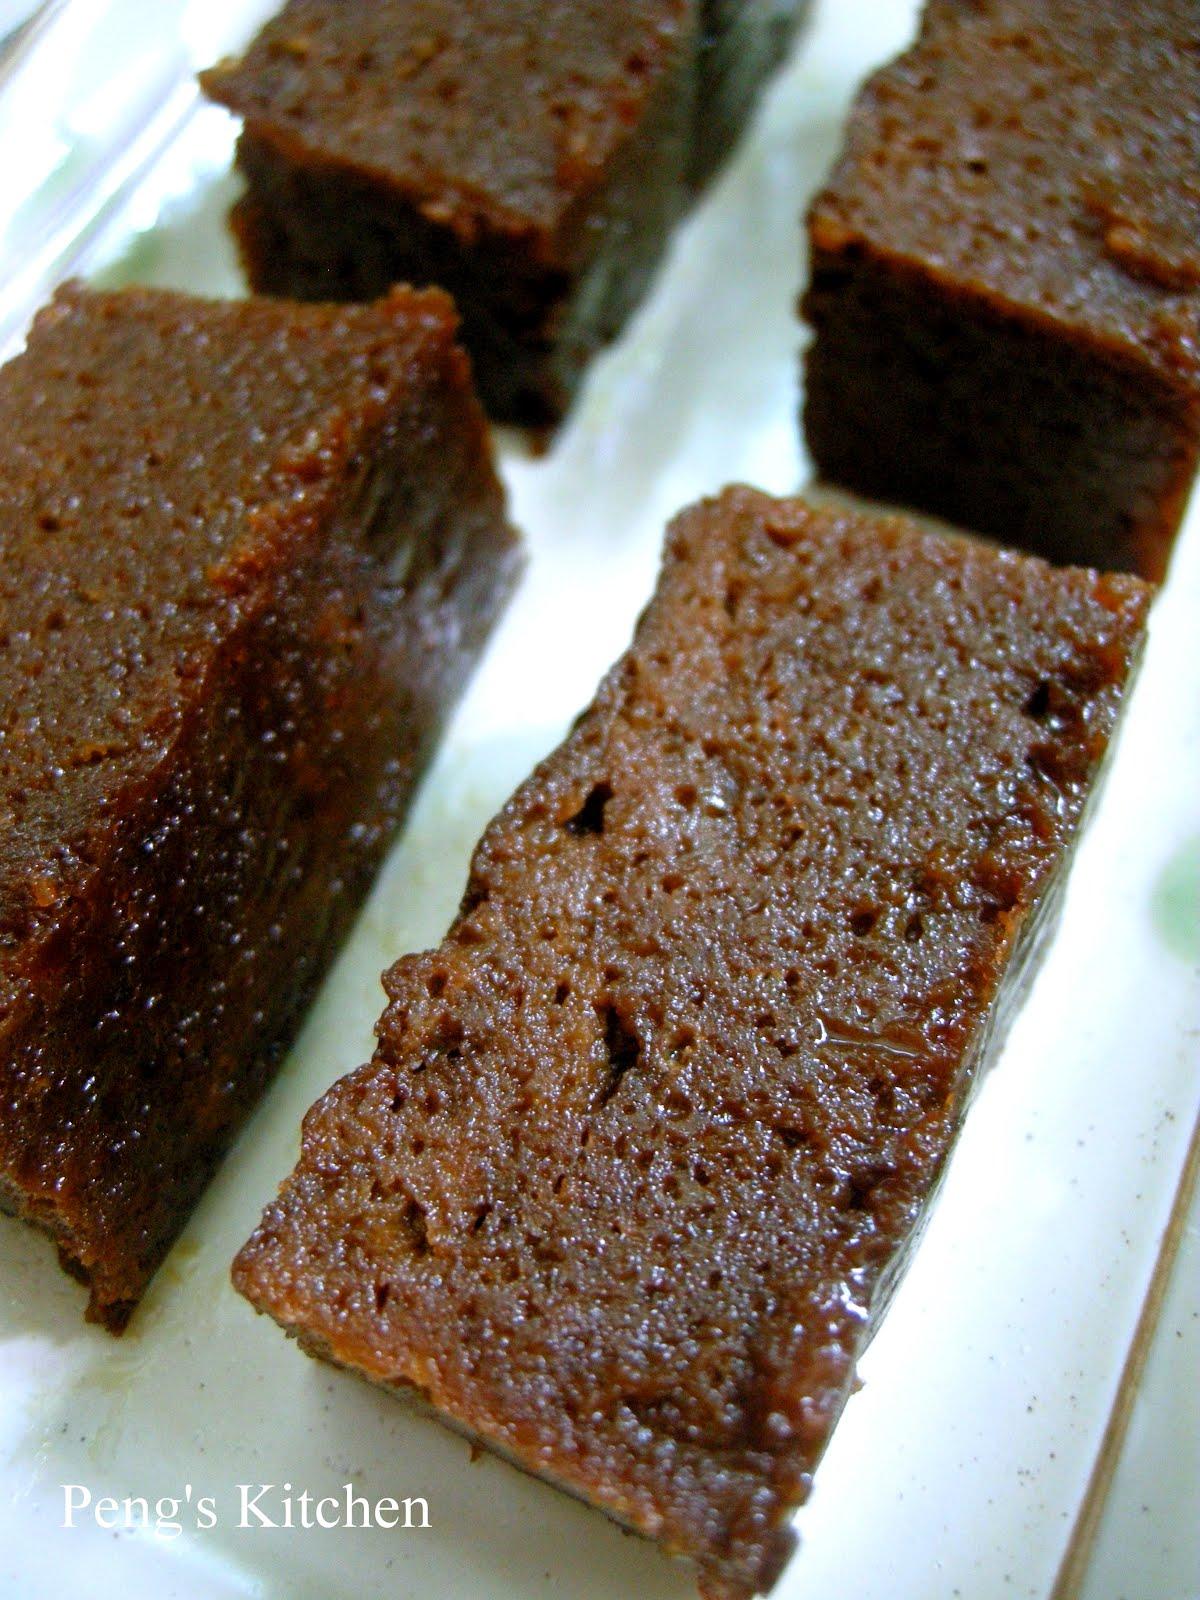 sarawak cake - photo #30